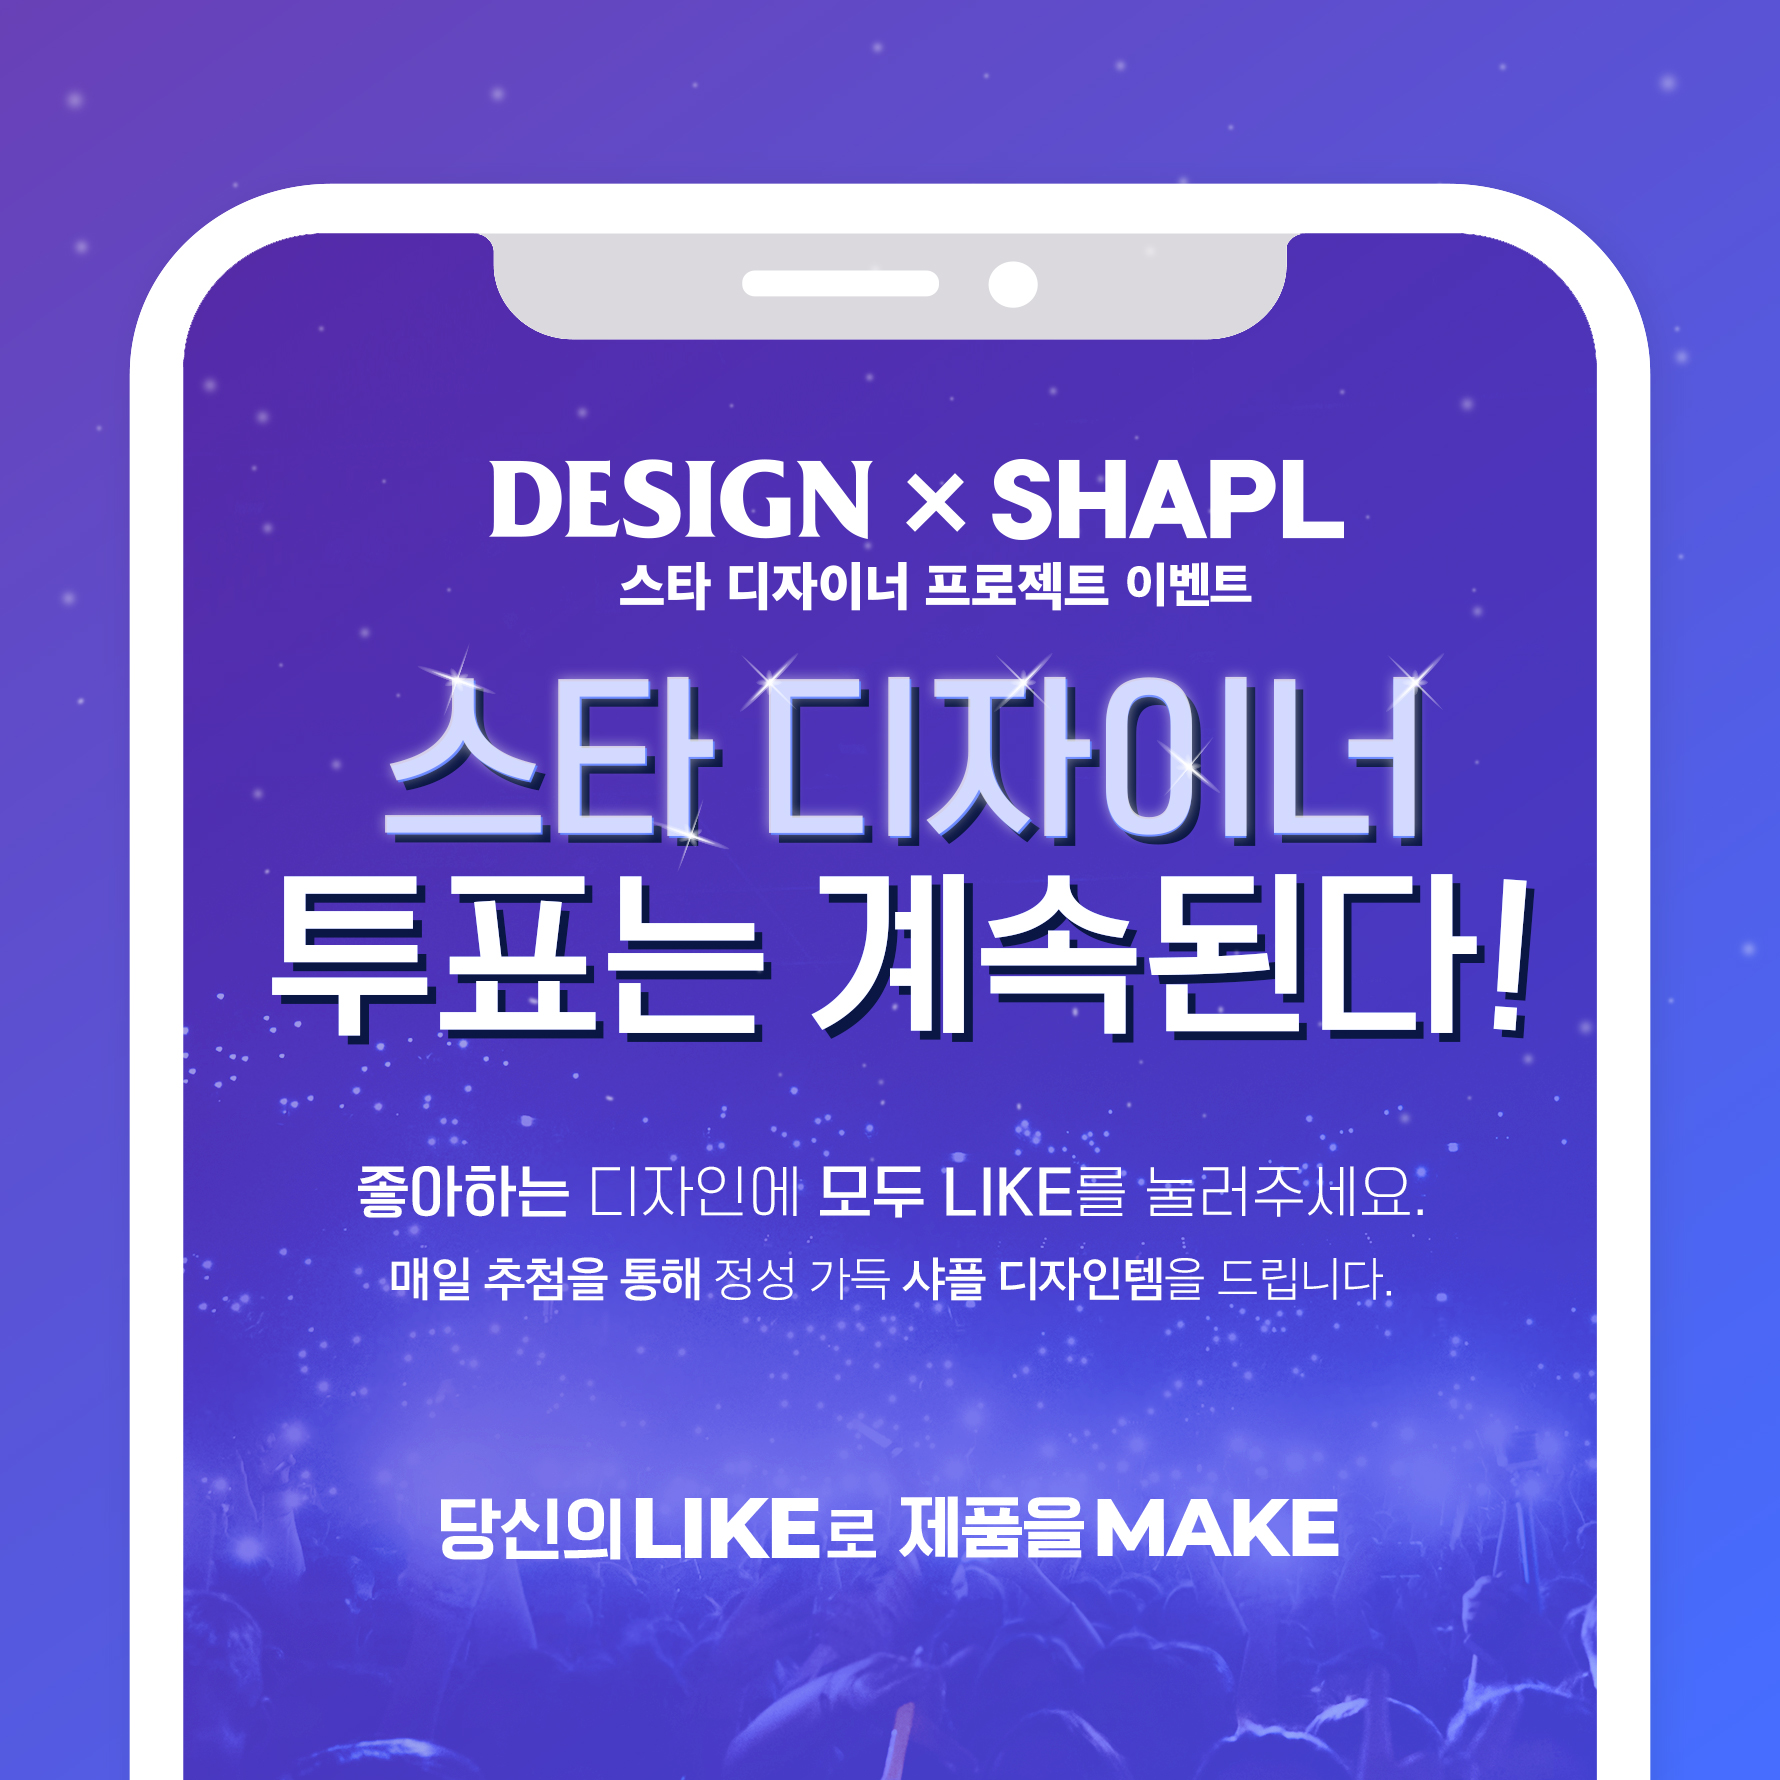 201901/SDF_SHAPL_Stardesign_Voting_181227_최종3.jpg